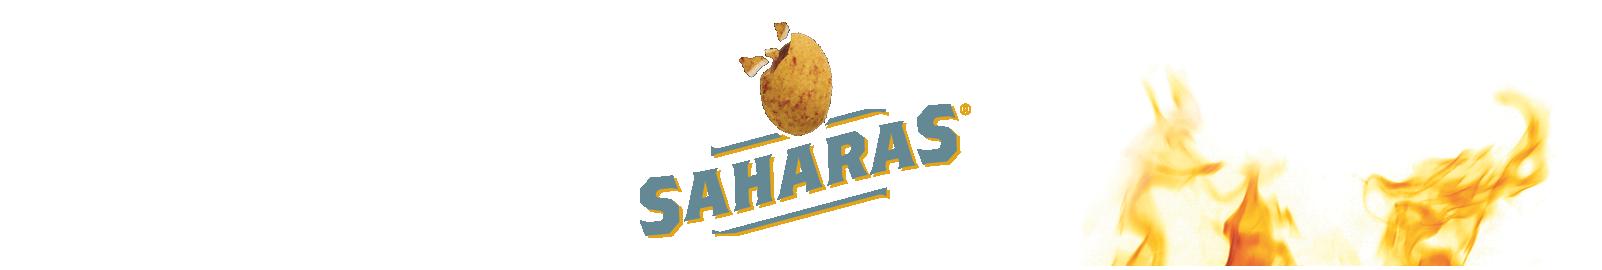 Saharas Retina Logo